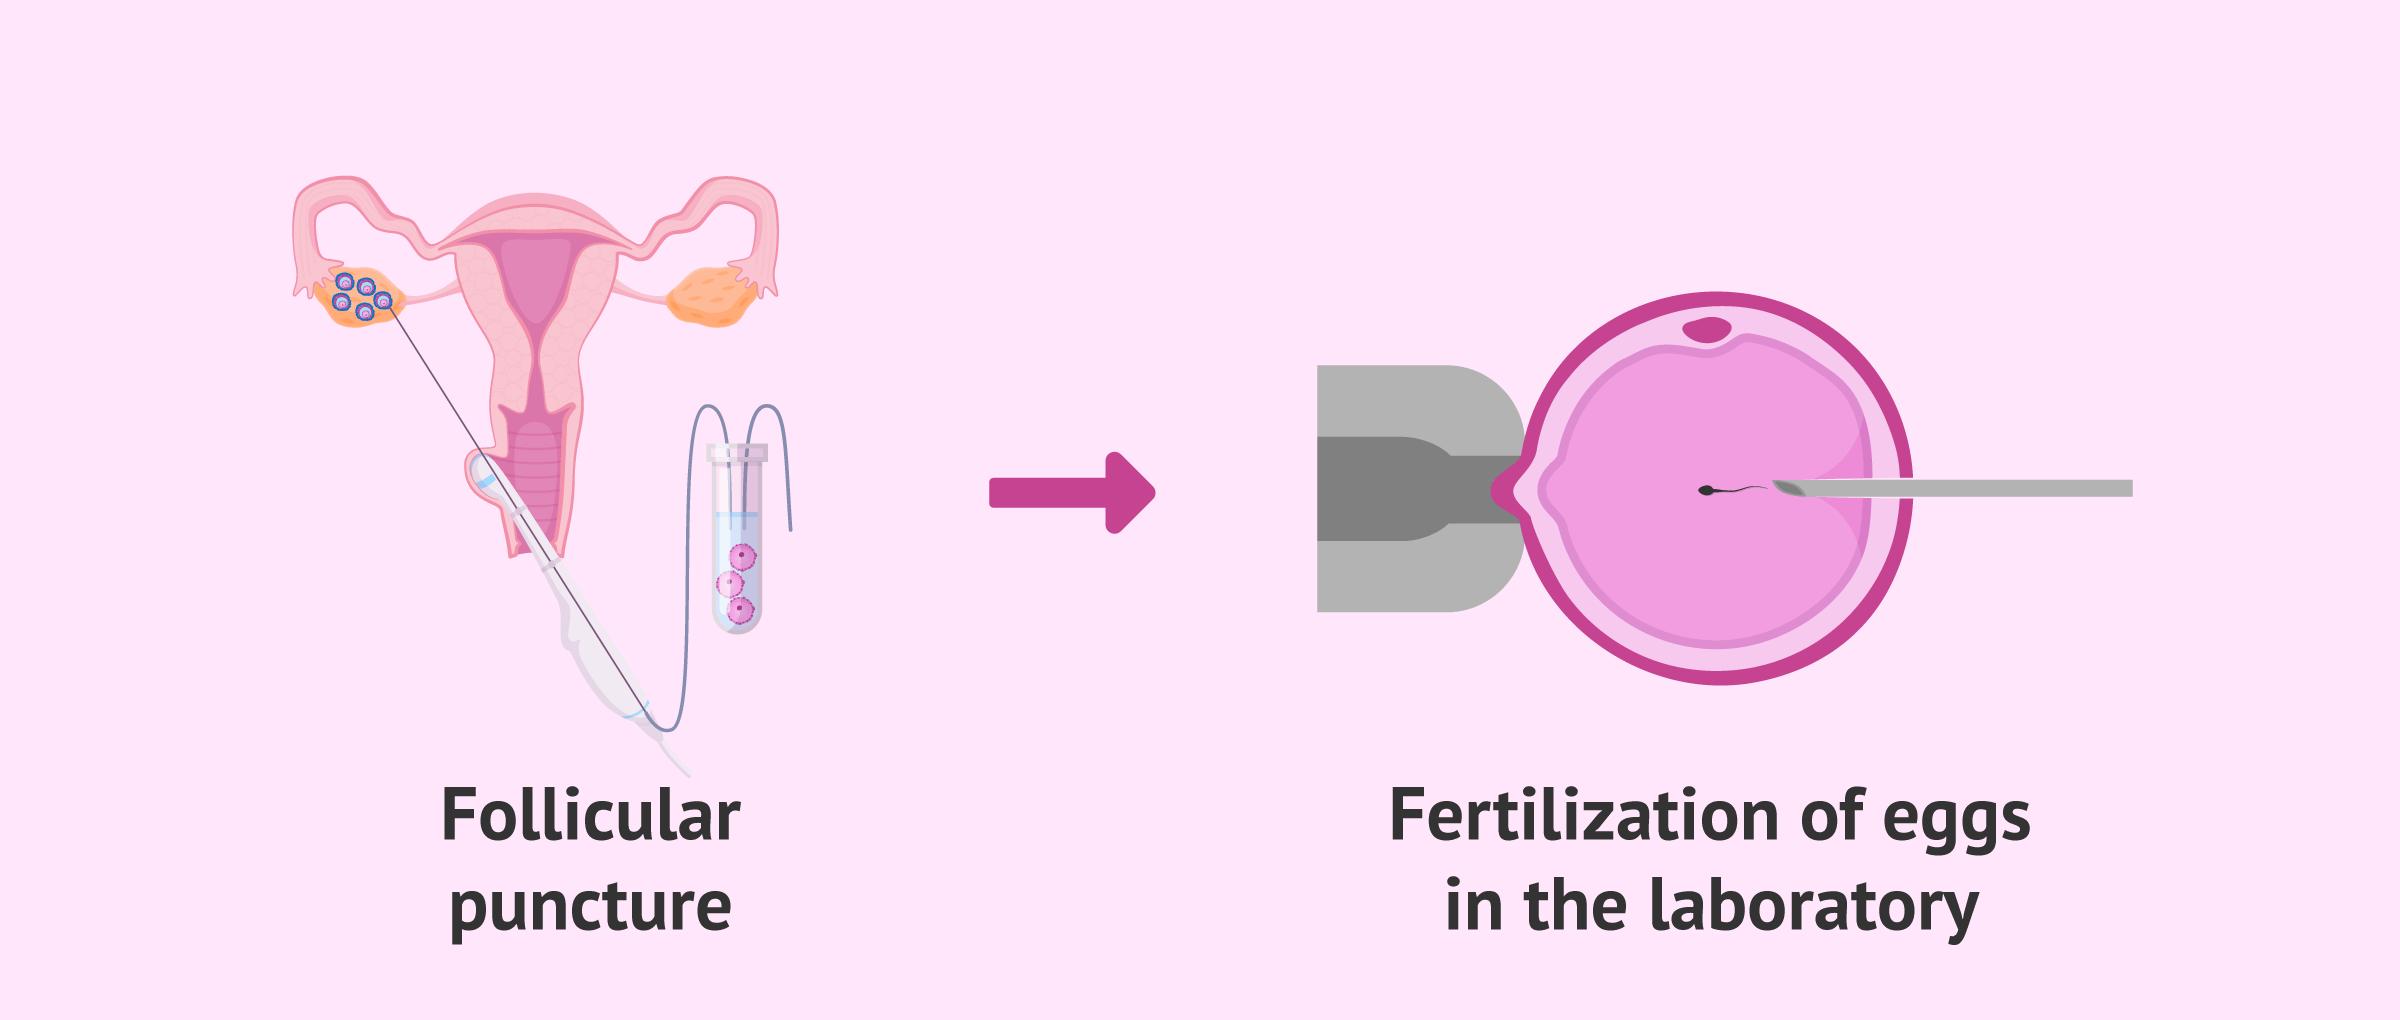 Follicular punction and fertilization